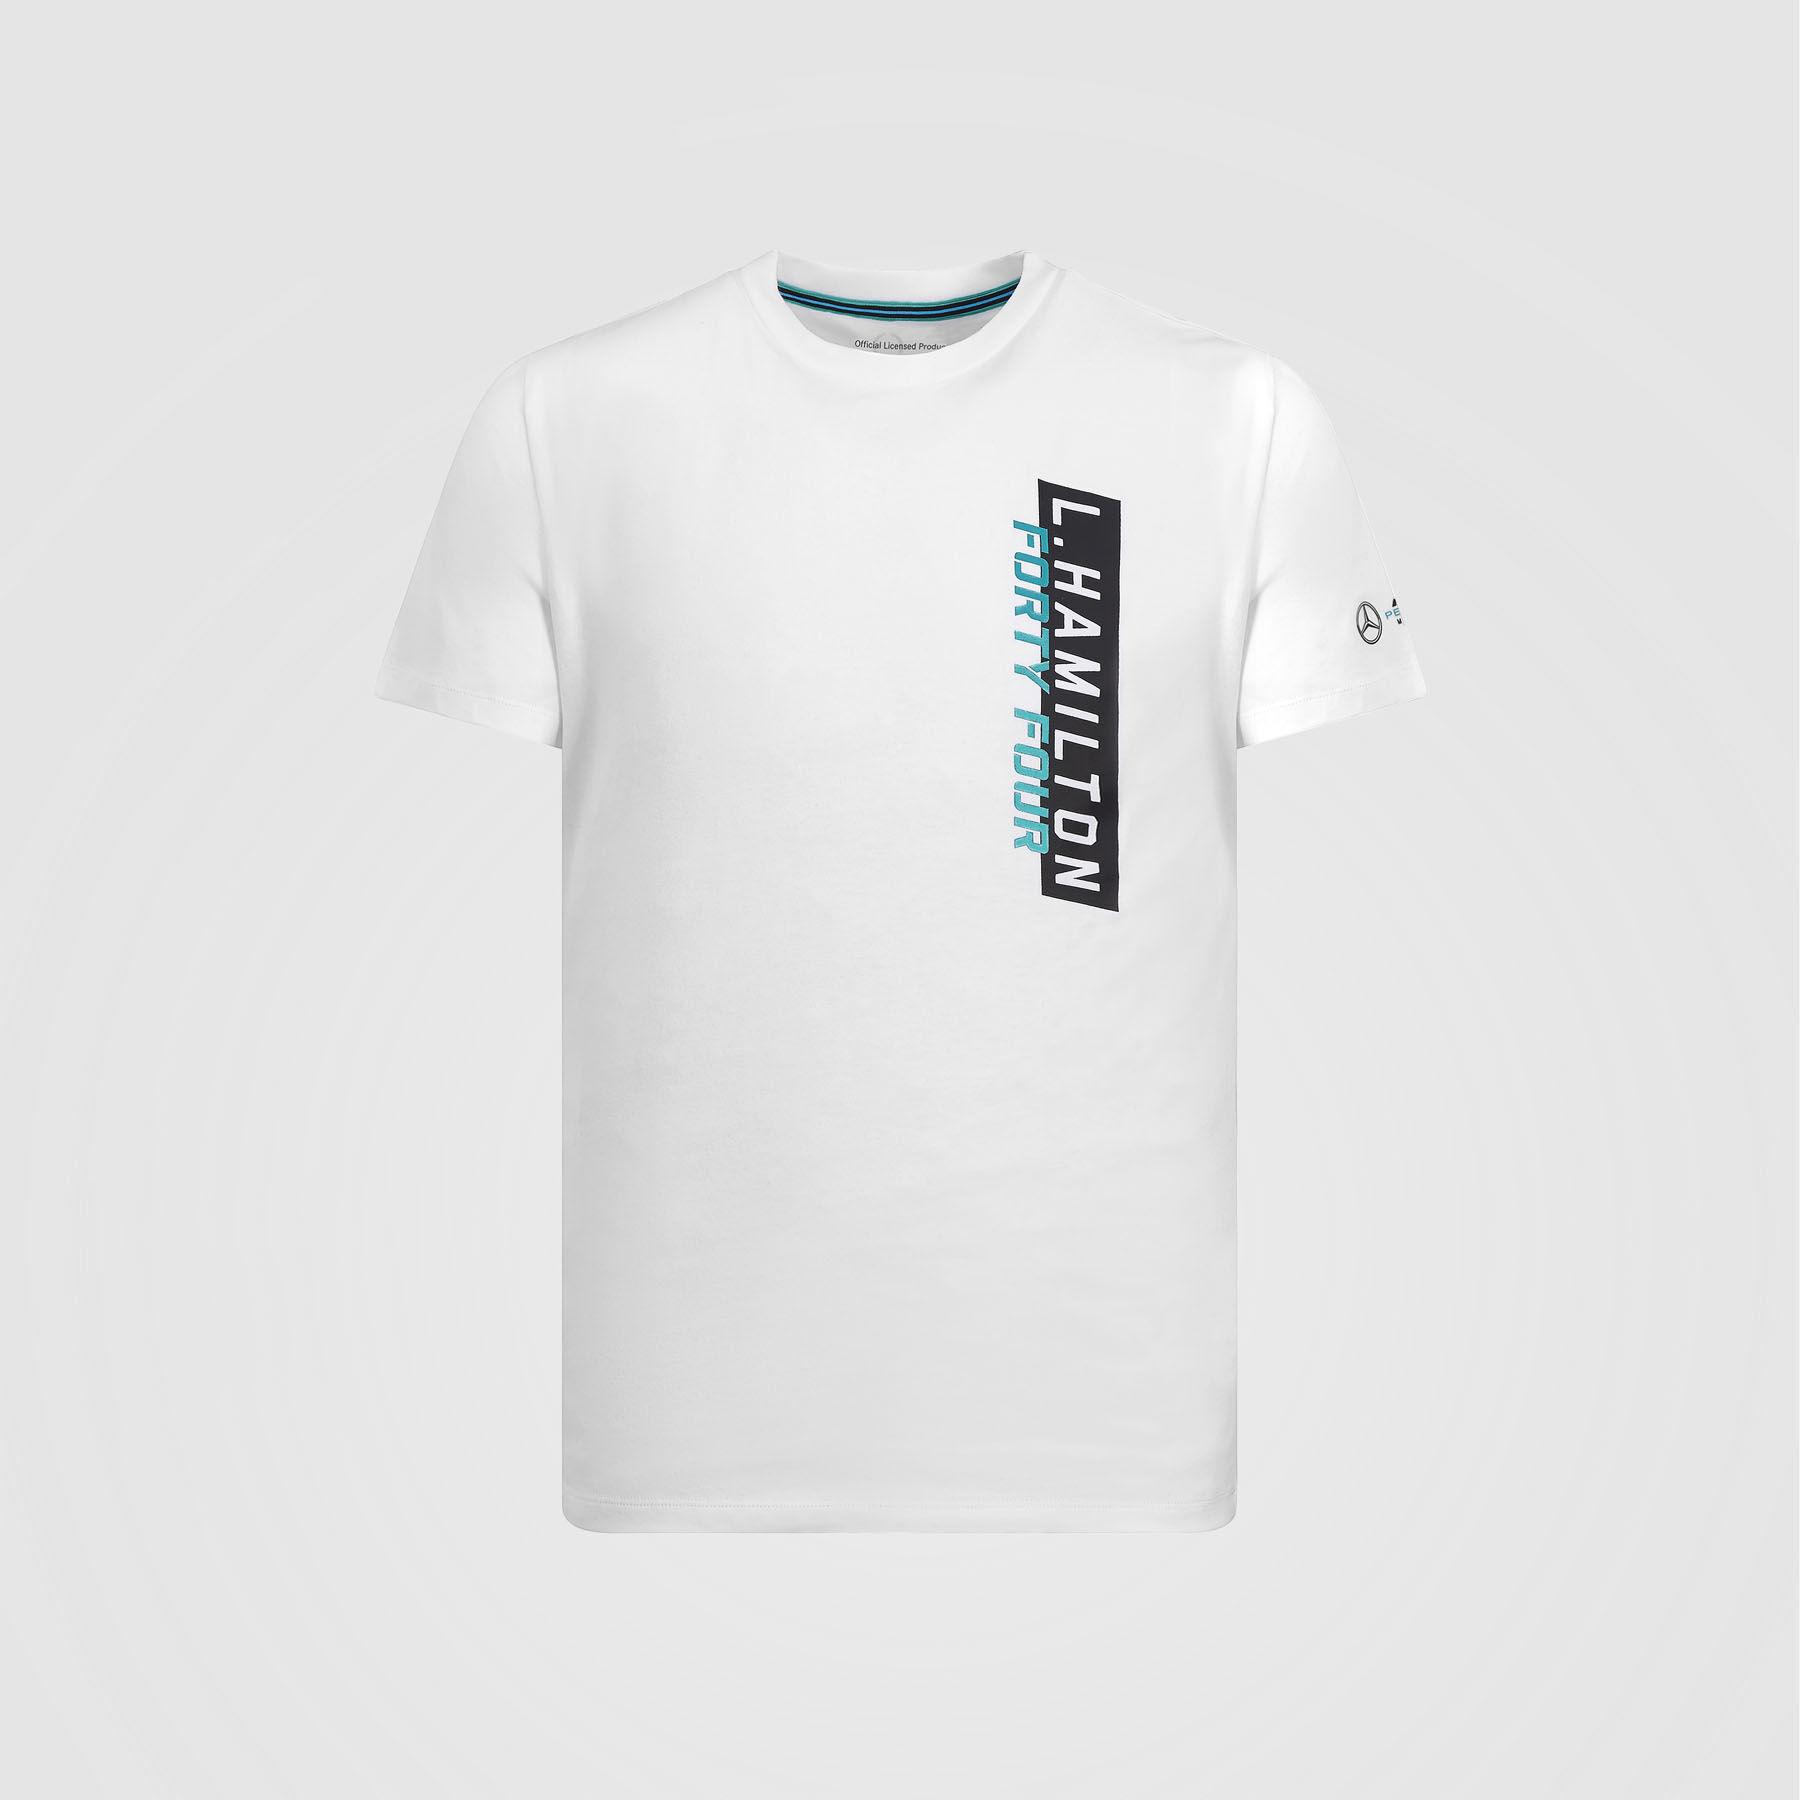 Branded Sports Merchandising B.V Mercedes AMG Petronas Motorsport Mens 2019 F1 White Team Shirt